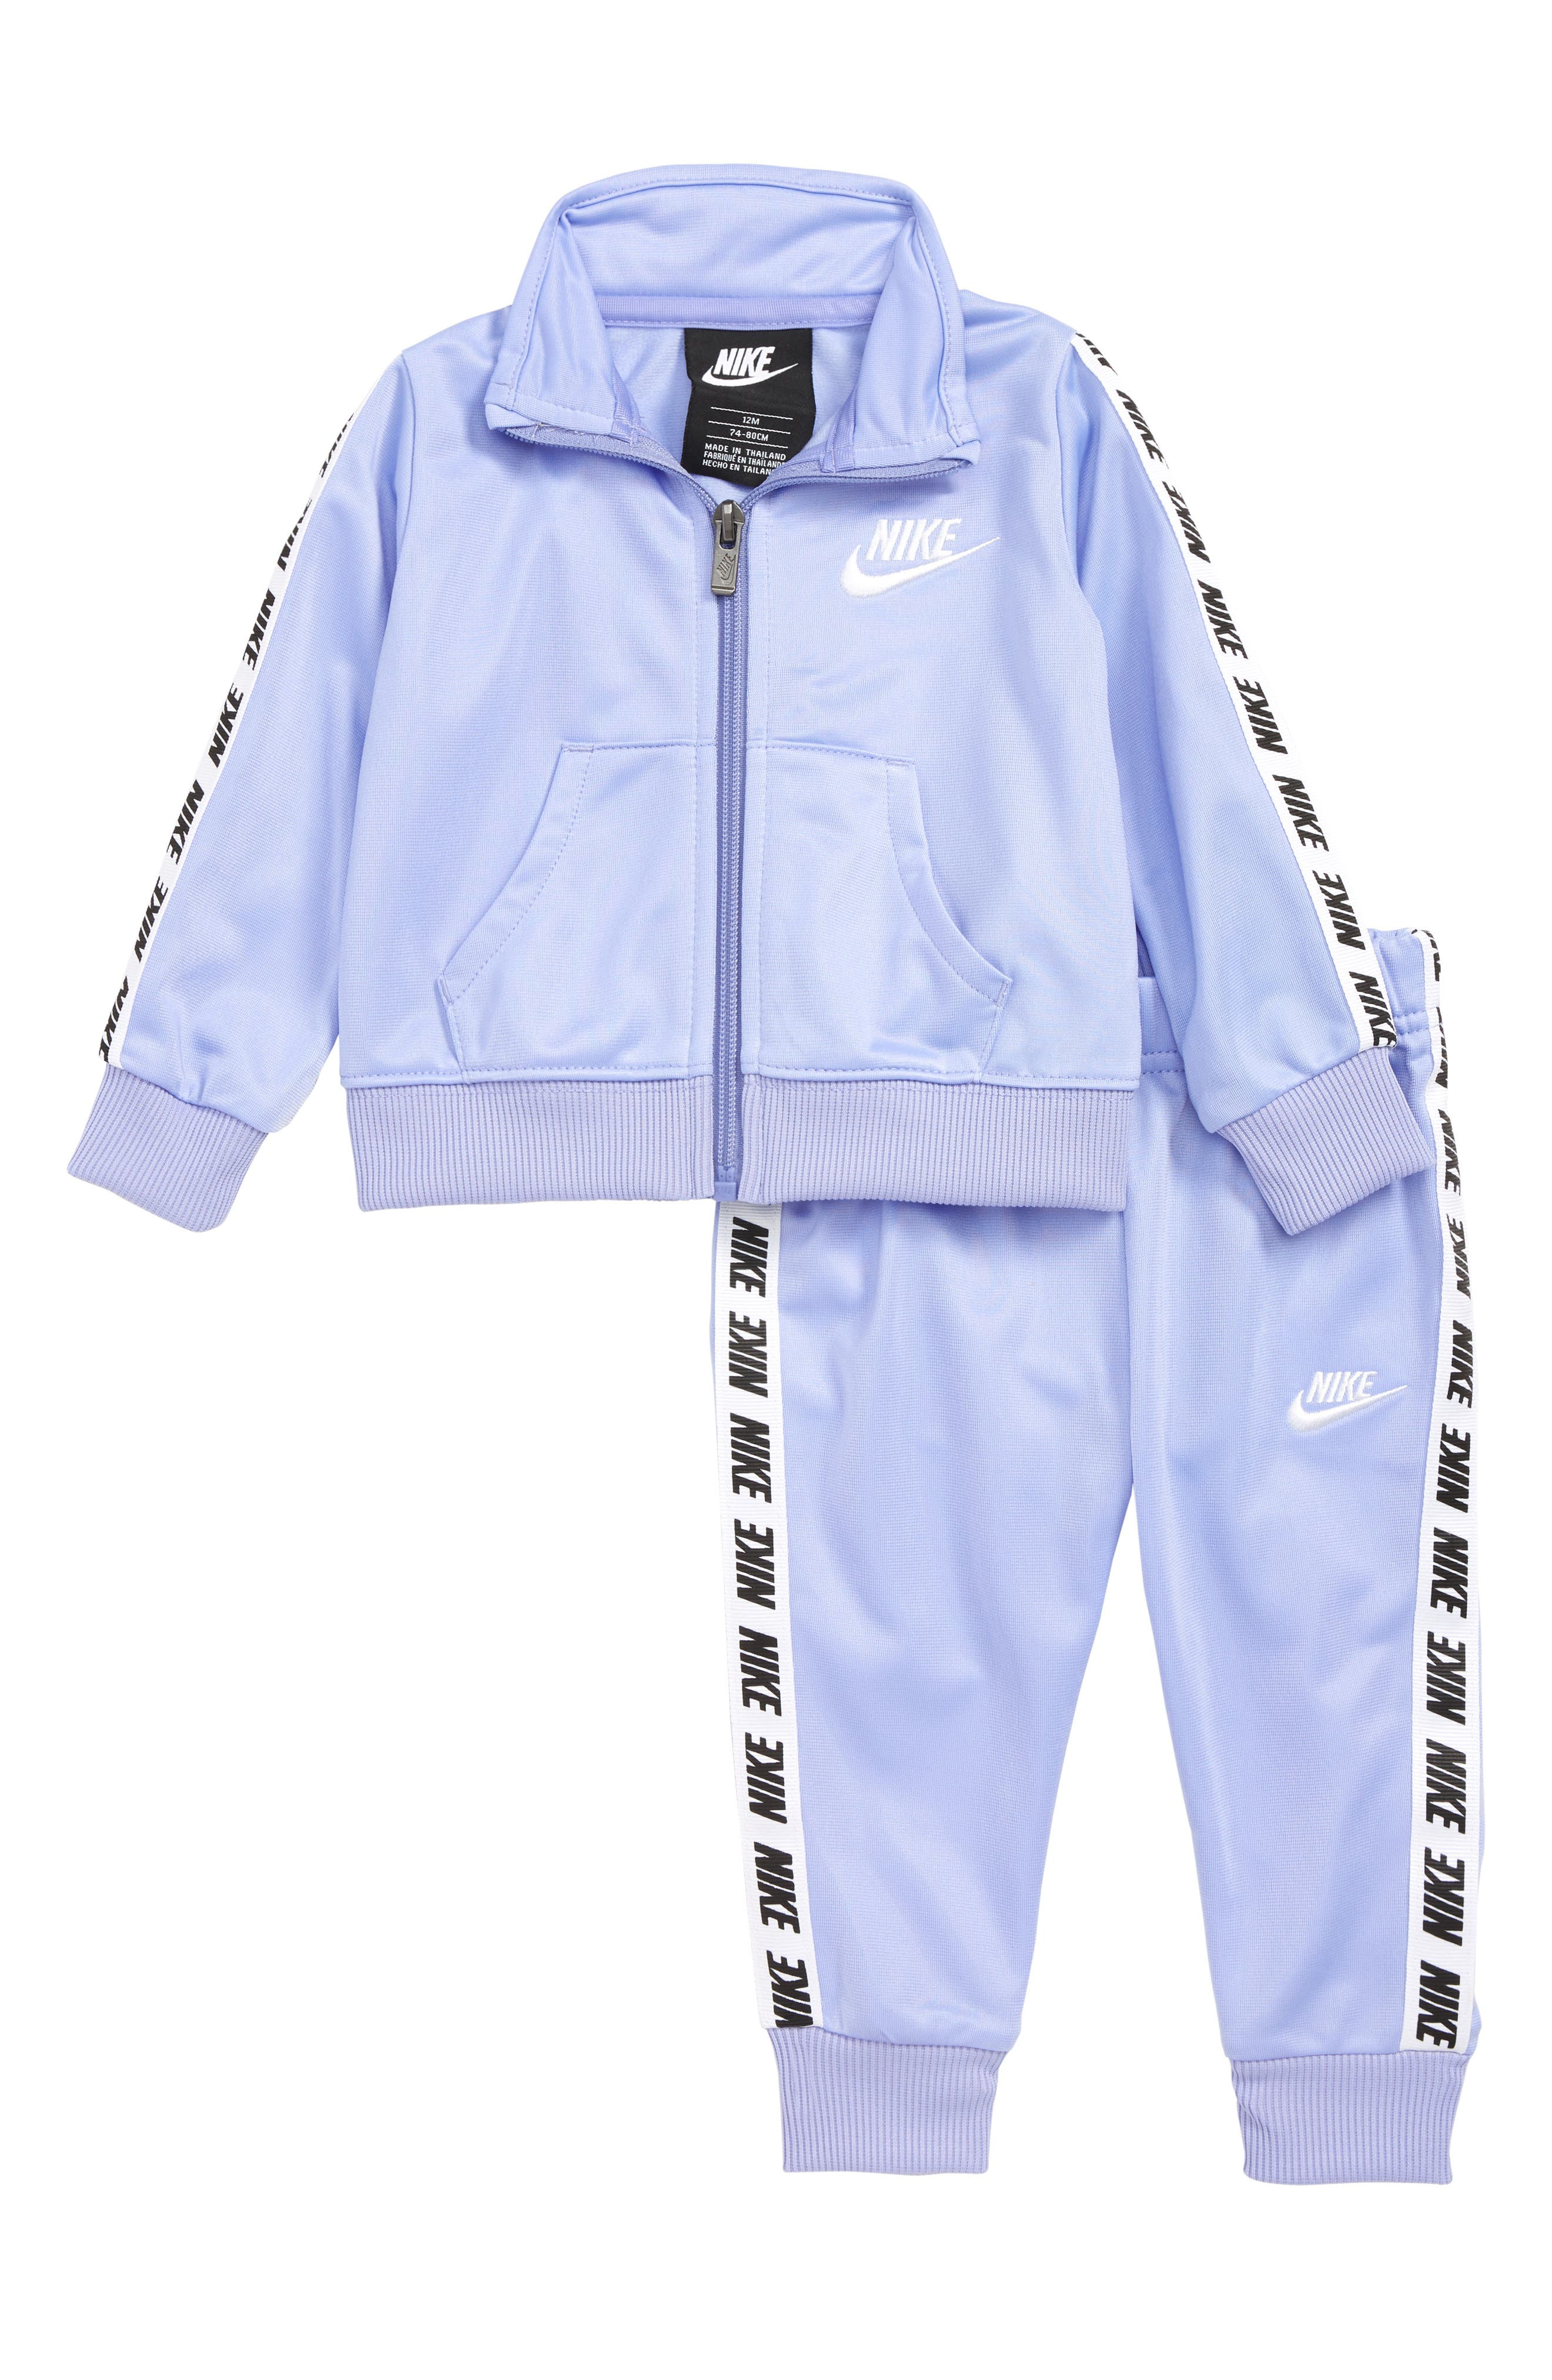 377864ec9d86 Nike Baby Clothing